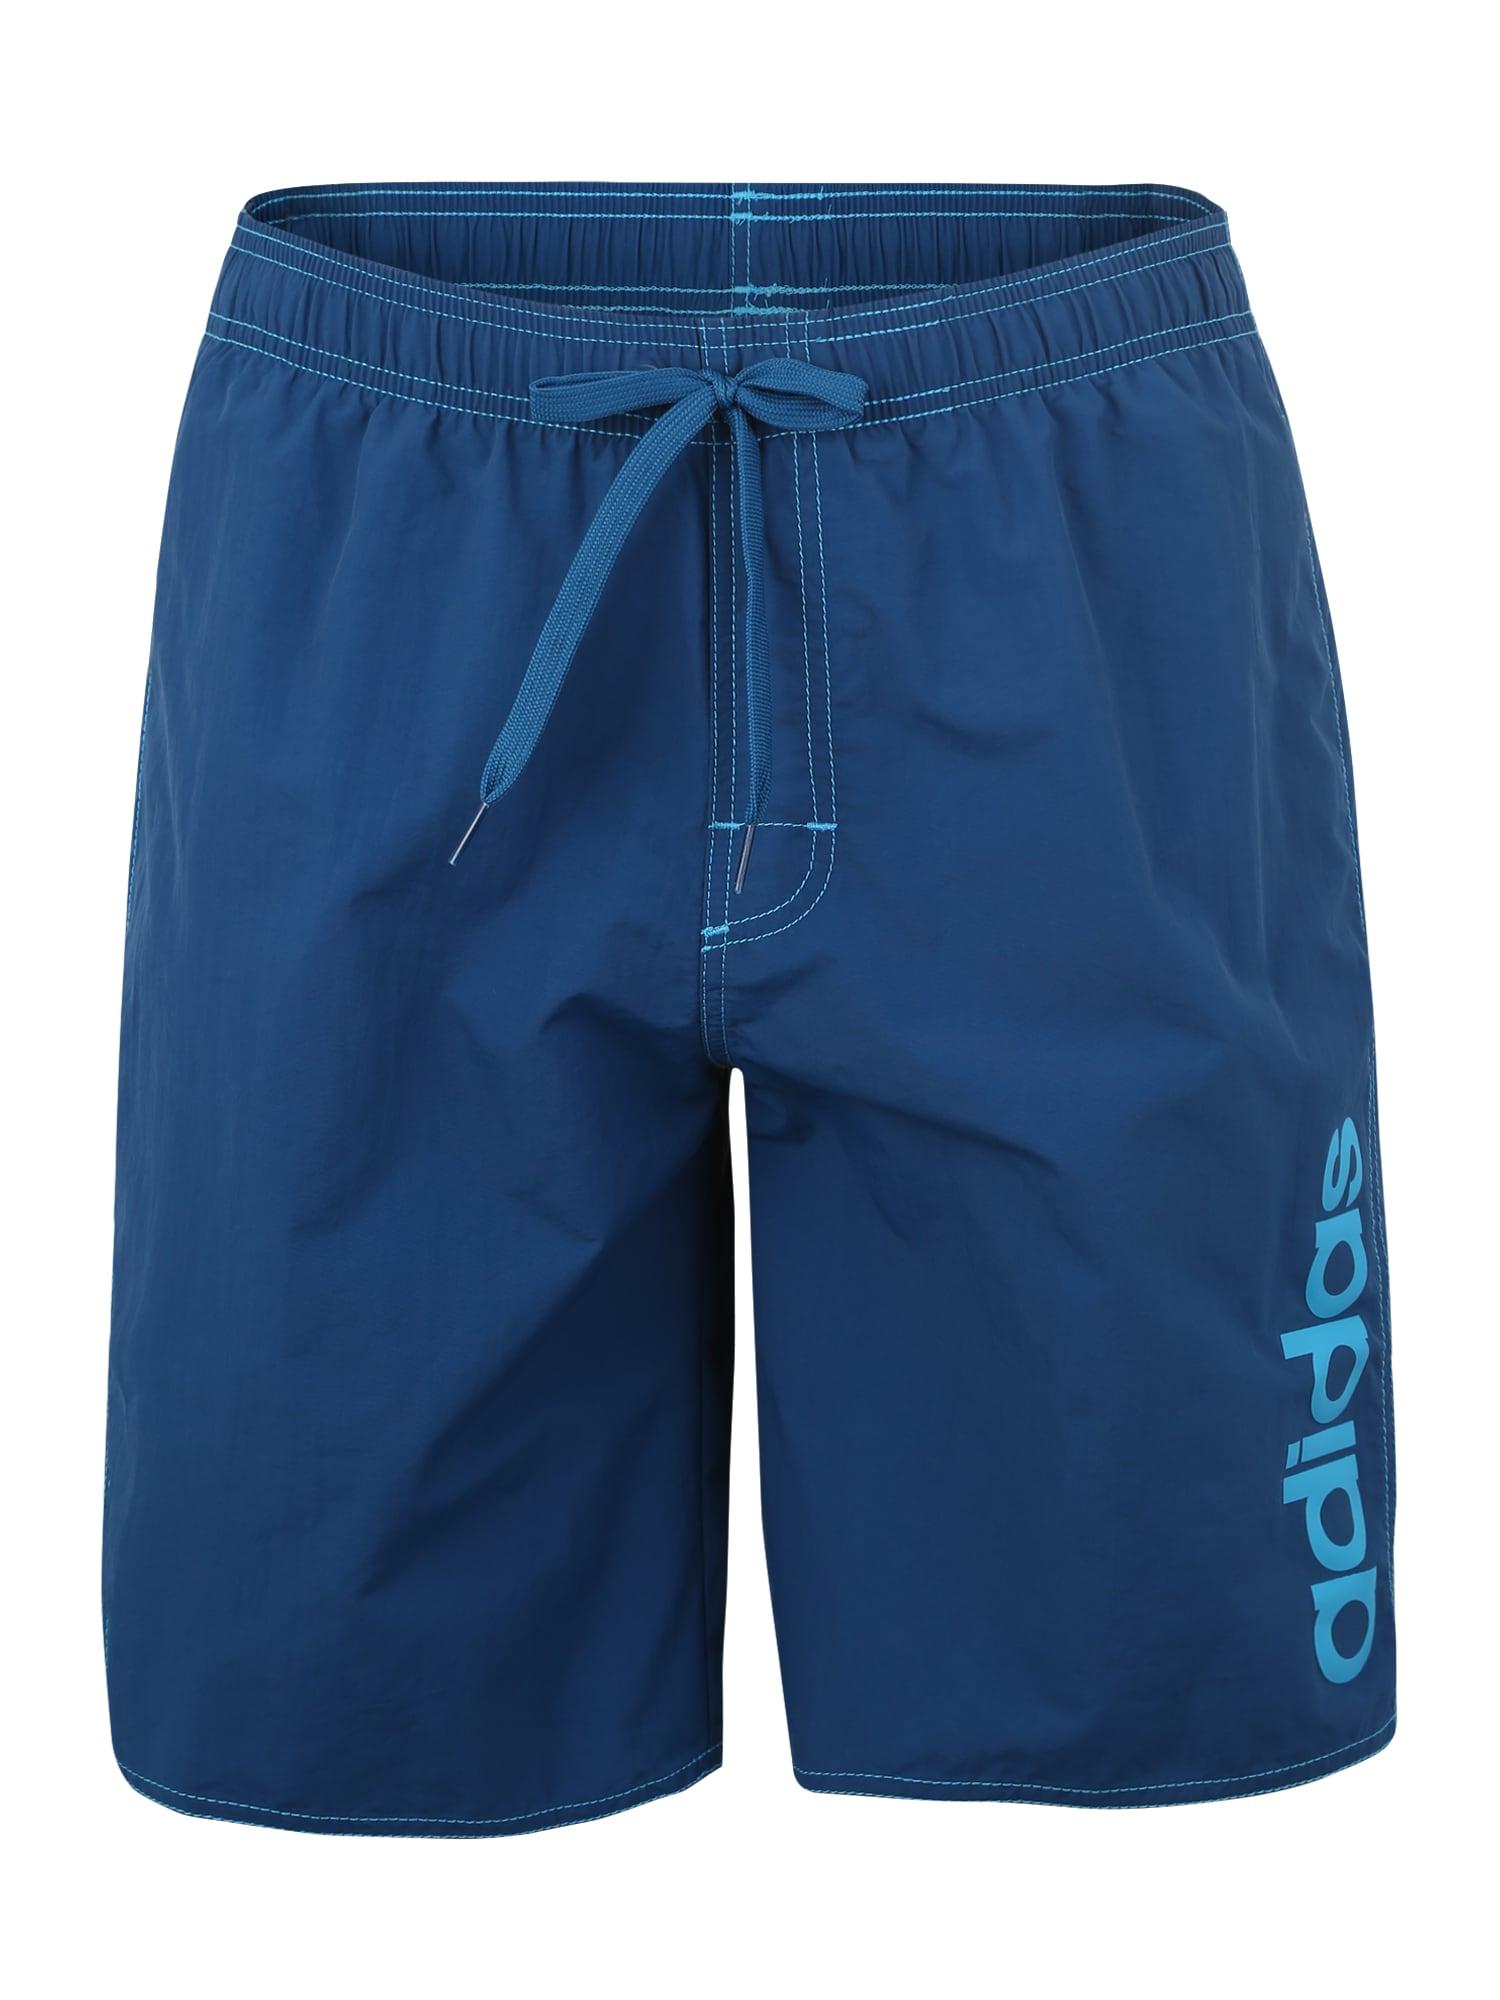 Sportovní plavky LIN SH CL marine modrá ADIDAS PERFORMANCE